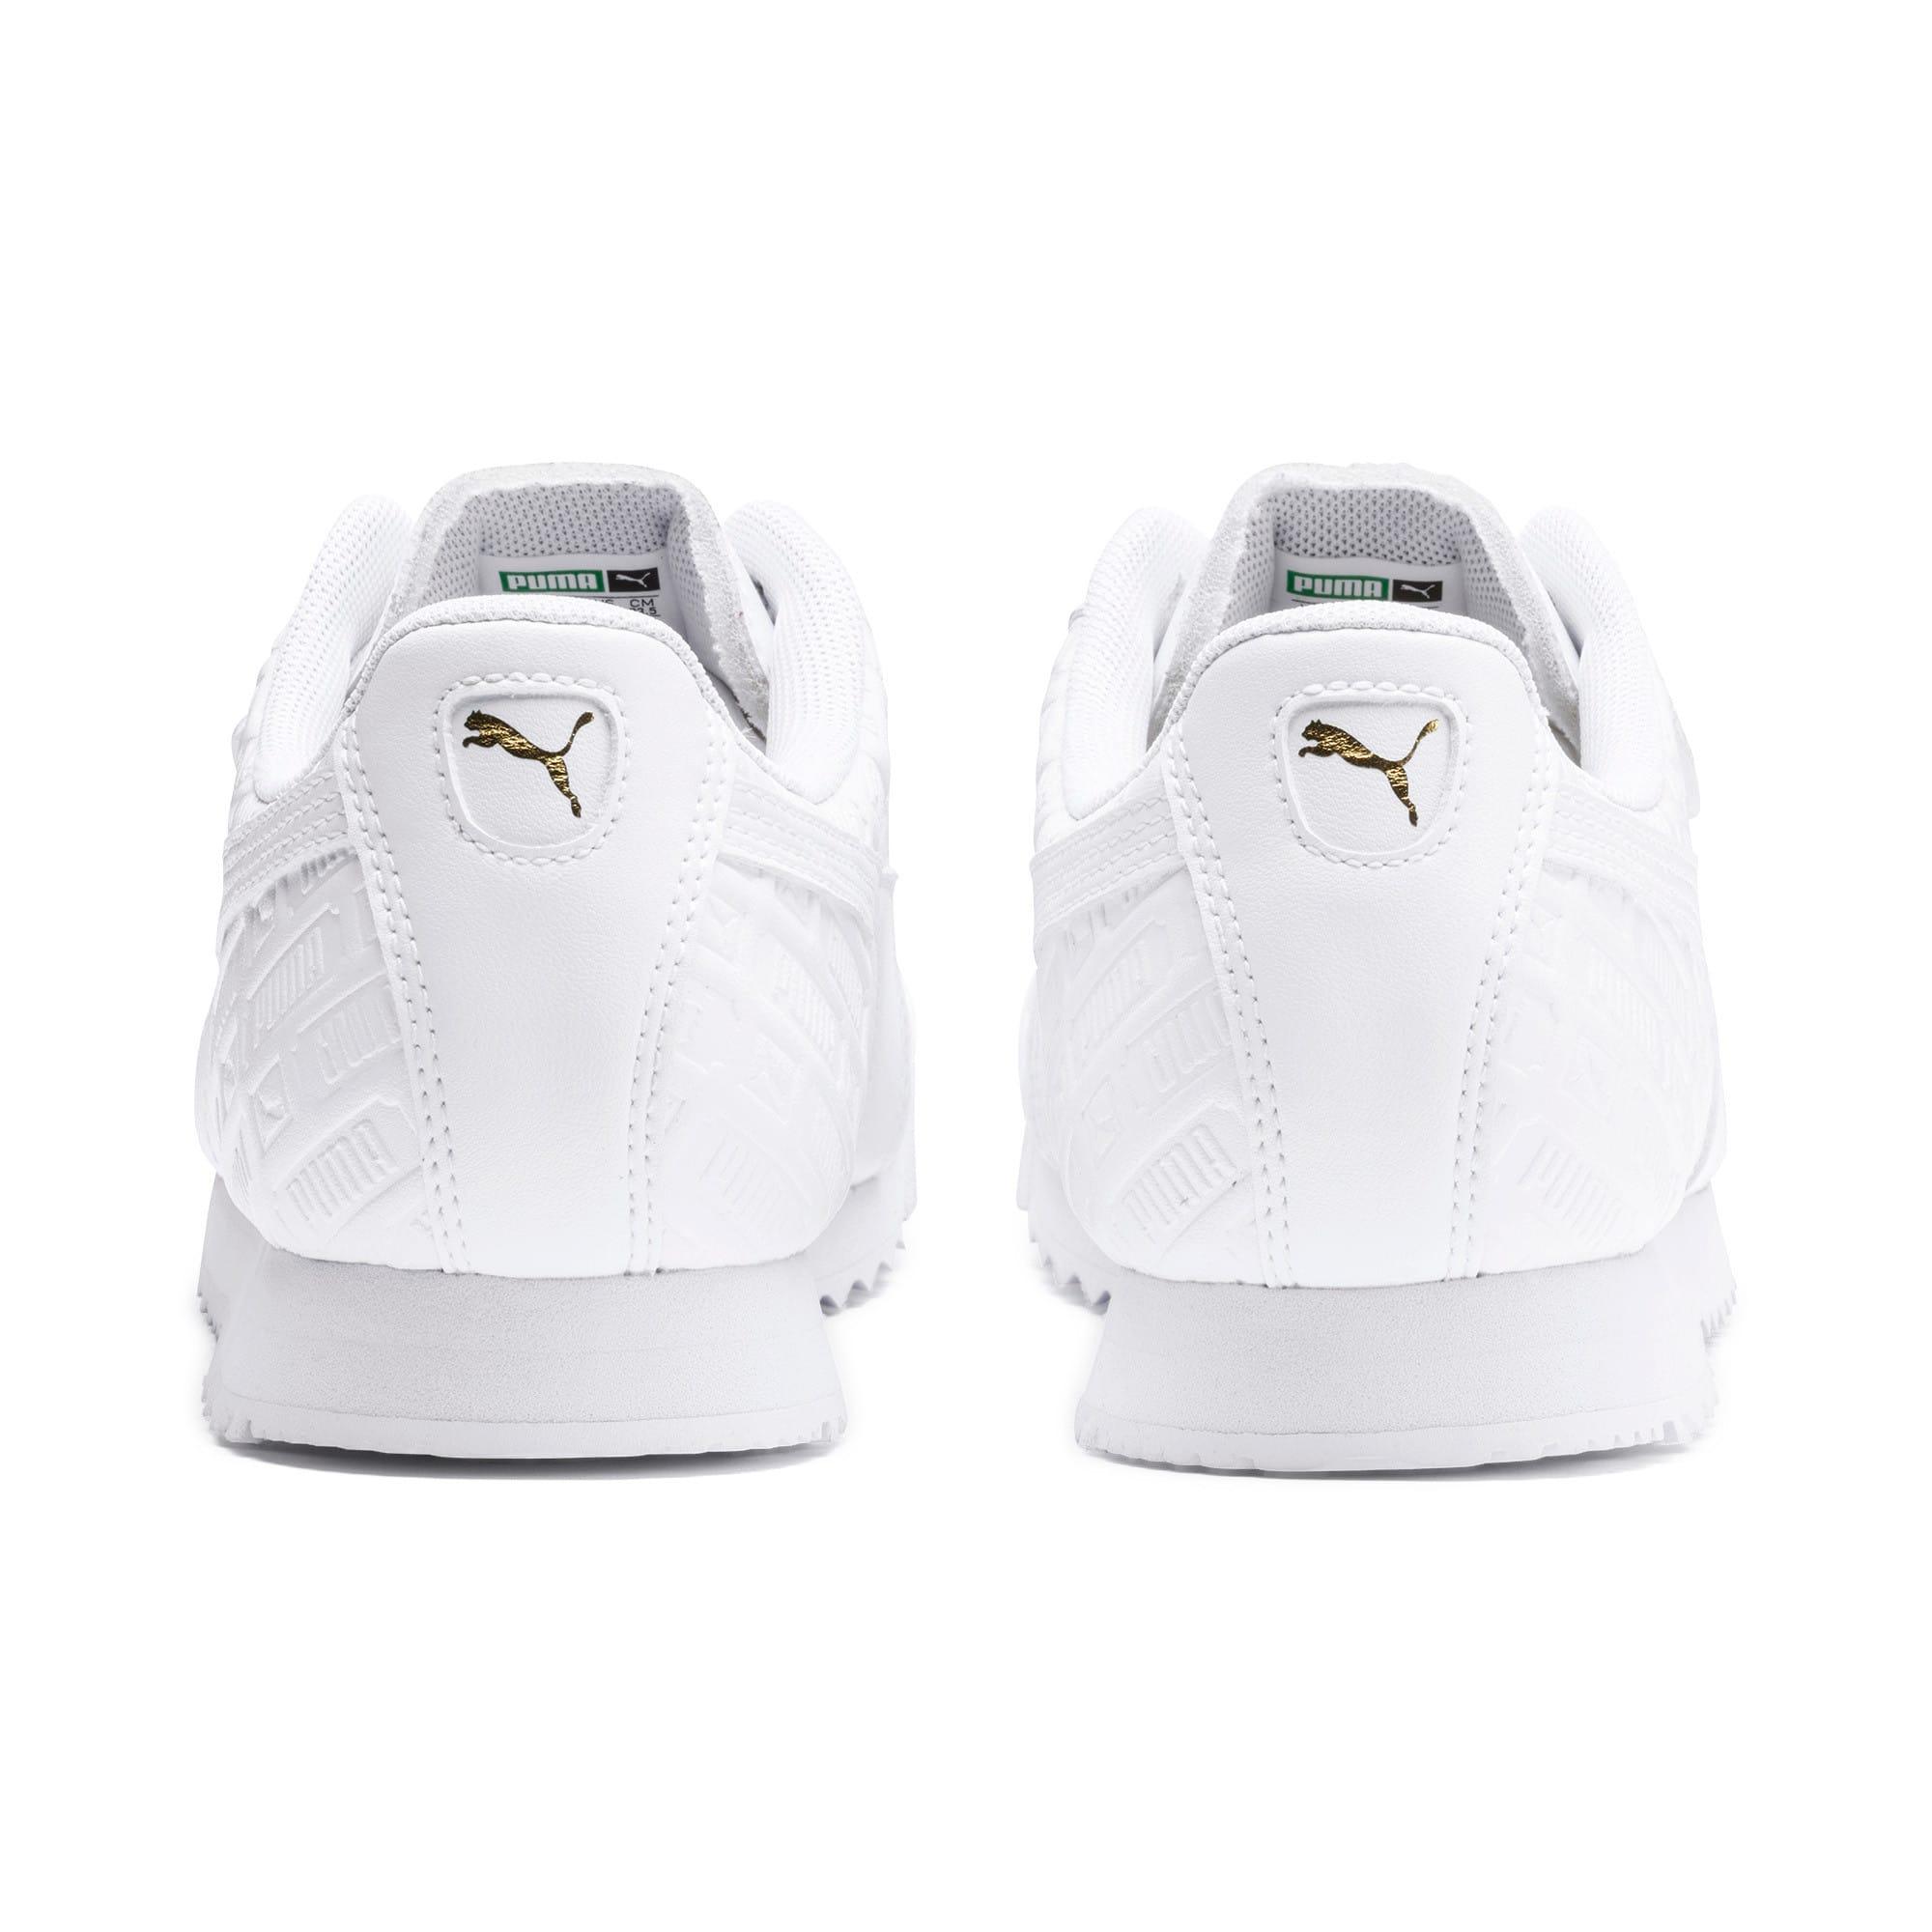 Thumbnail 4 of Roma Reinvent Women's Sneakers, Puma White-Puma Team Gold, medium